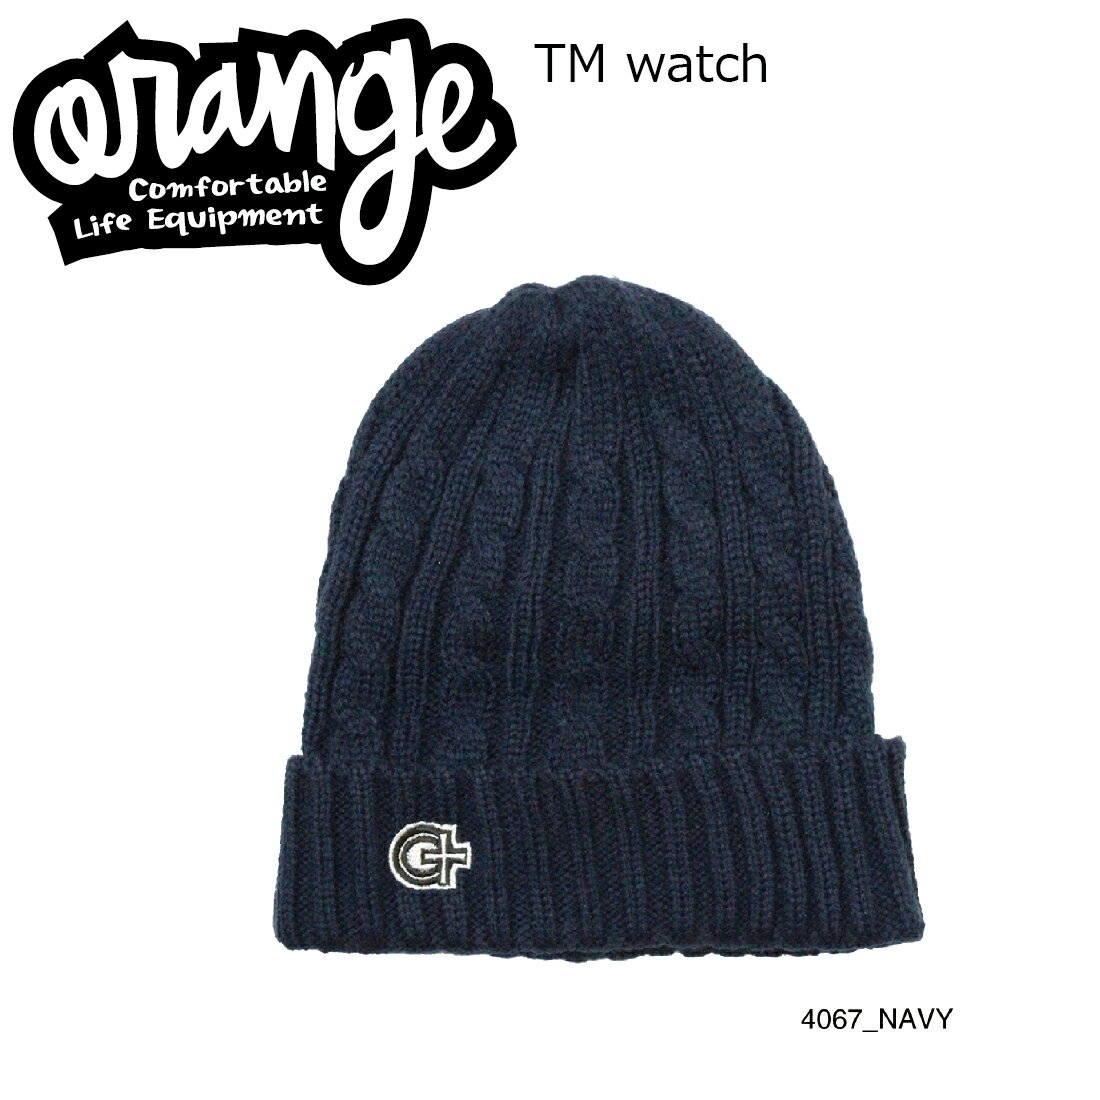 Oran'ge Tm Watch Cap Beanie 4067 NAVY オレンジ ティーエム ワッチ キャップ ビーニー ニットキャップ 2つ折り